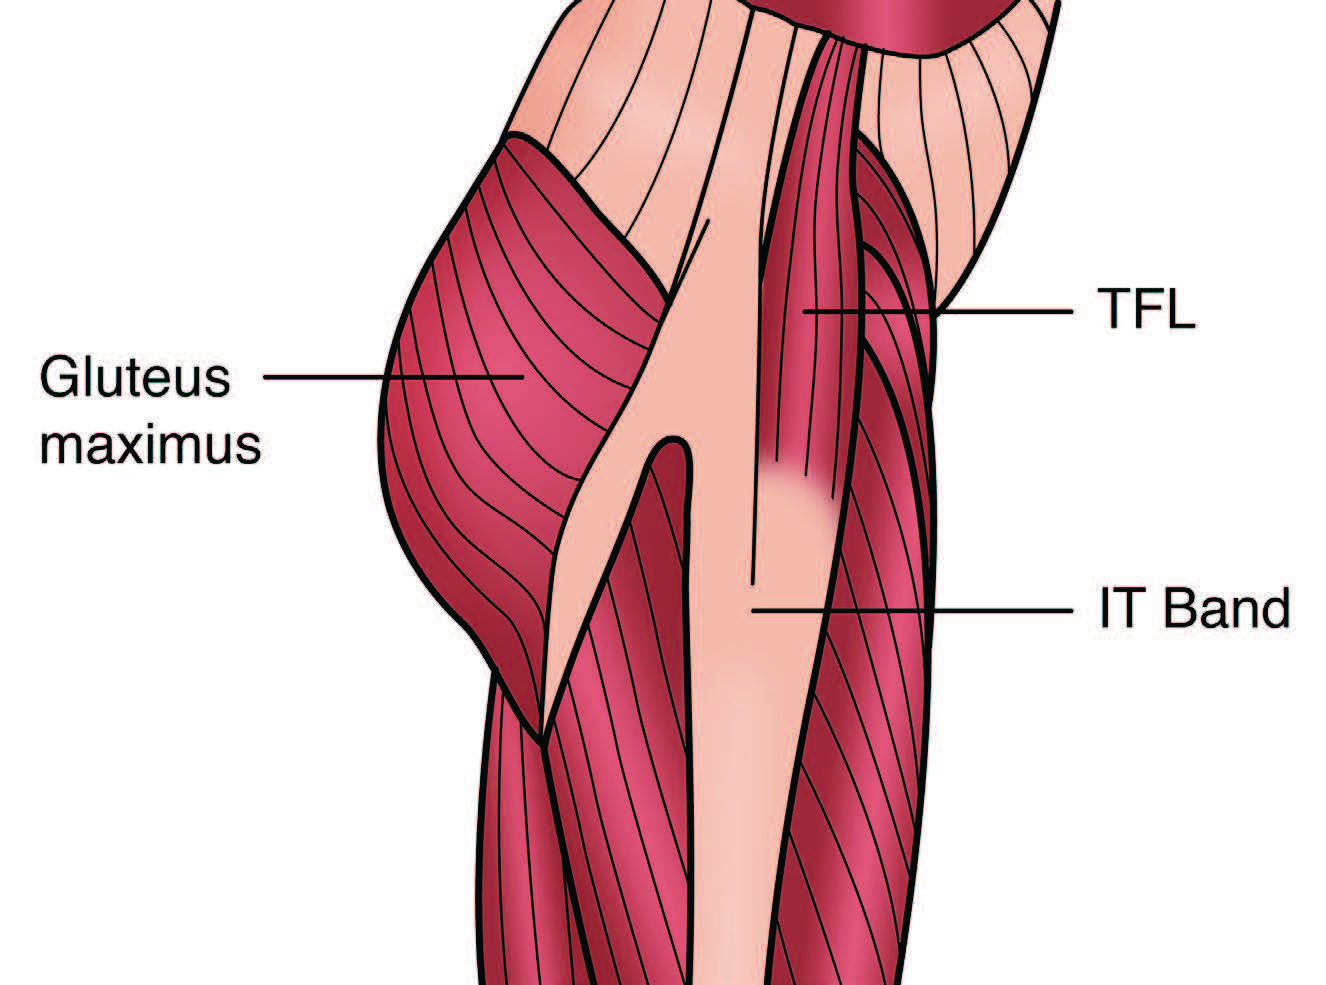 Tensor Fascia Latae Dysfunction and Sciatica